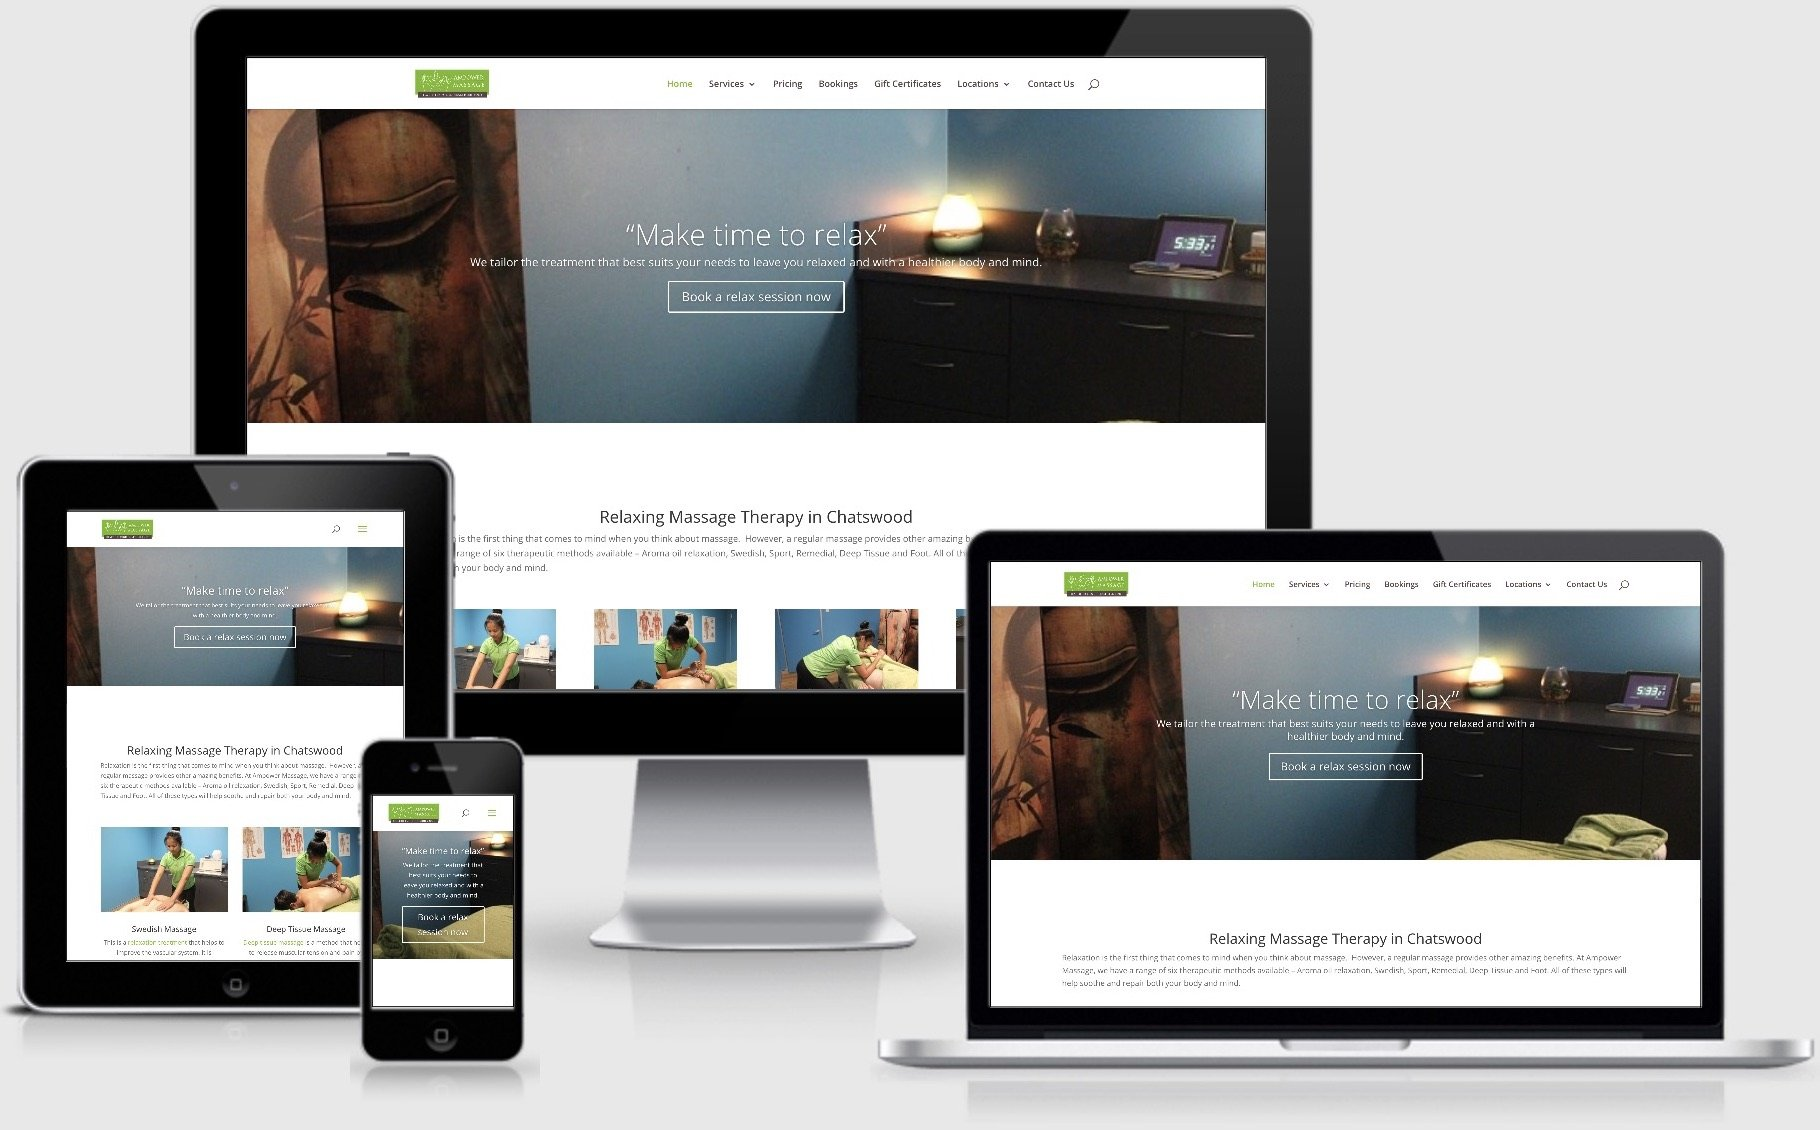 Marketing-Squad-APM-Websites